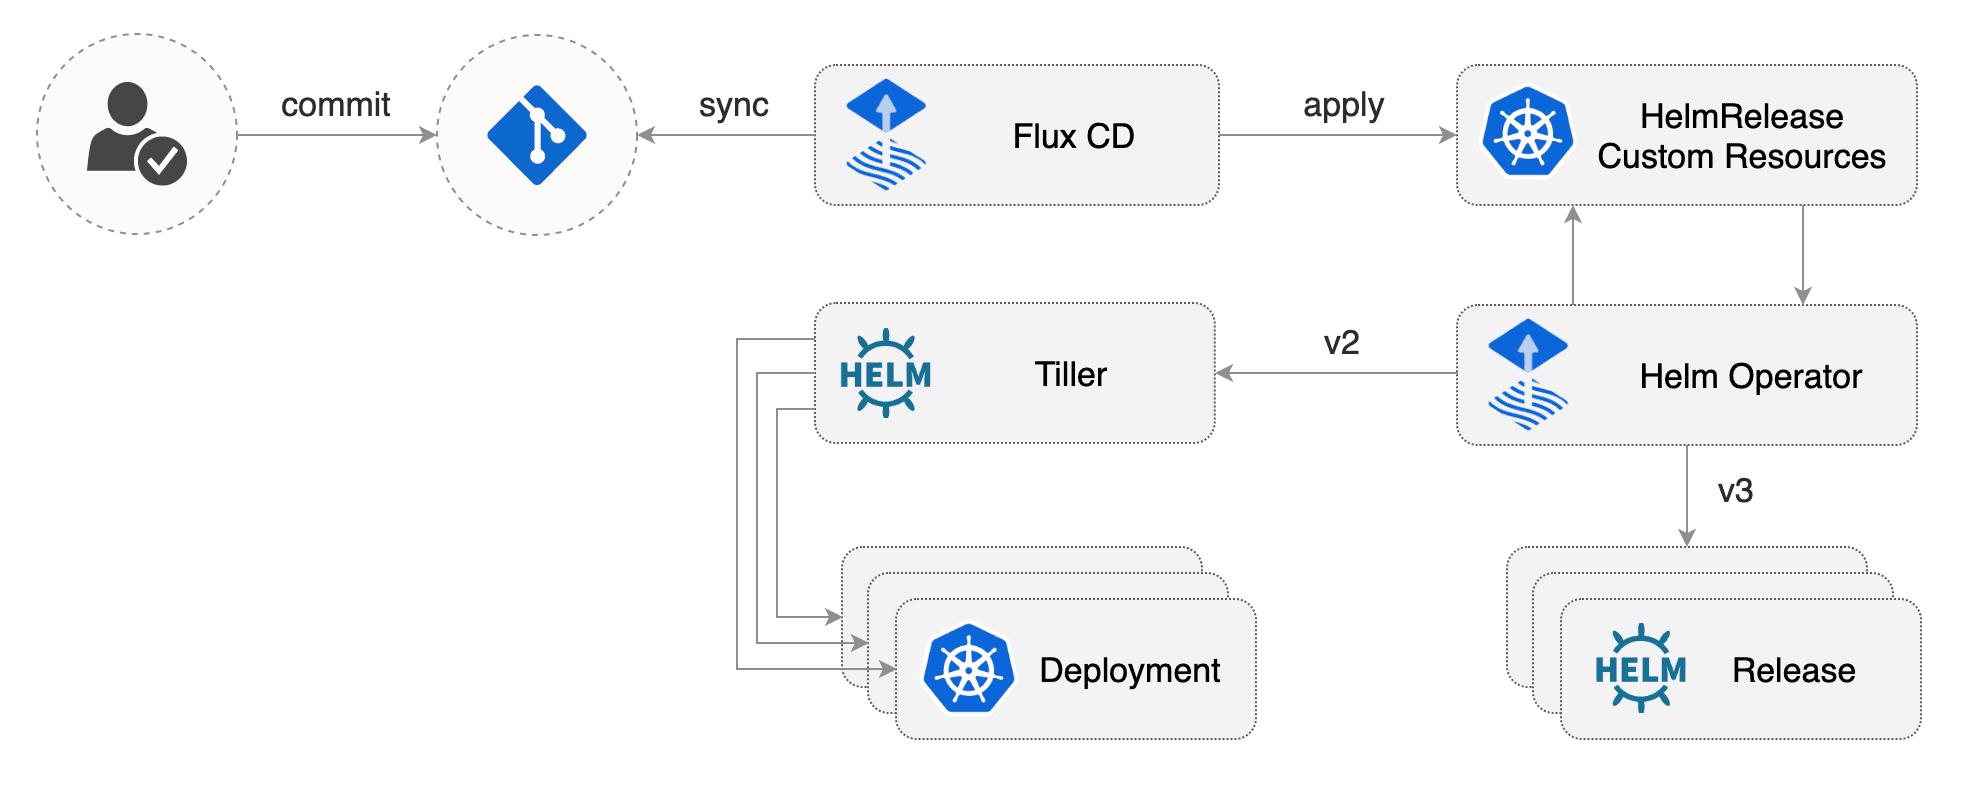 fluxcd-helm-operator-diagram.png